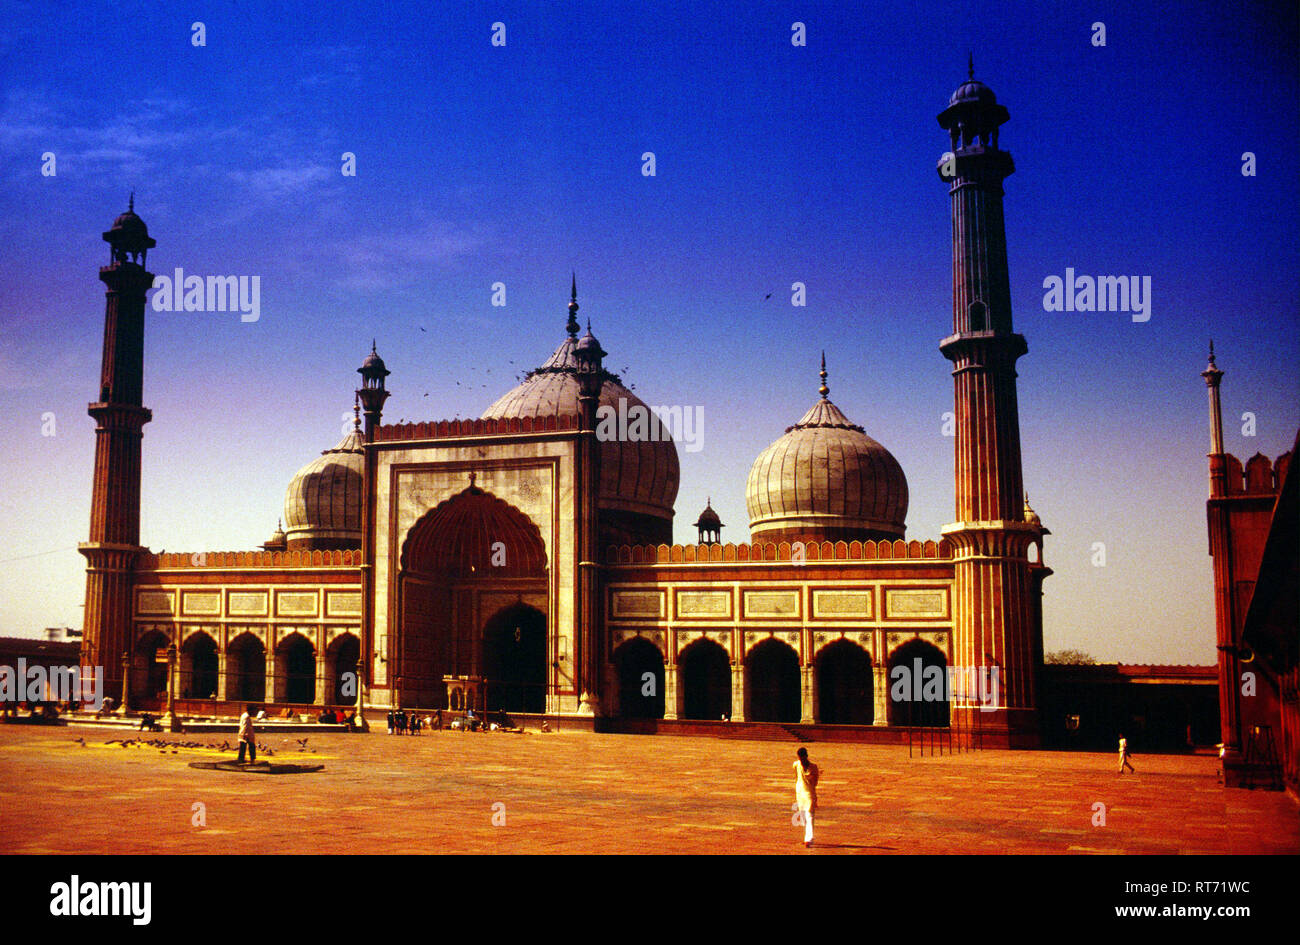 The Masjid-i Jahān-Numā, Jama Masjid, Friday Mosque, built by, Mughal Emperor, Shah Jahan, 1644 and 1656, Delhi, India, - Stock Image